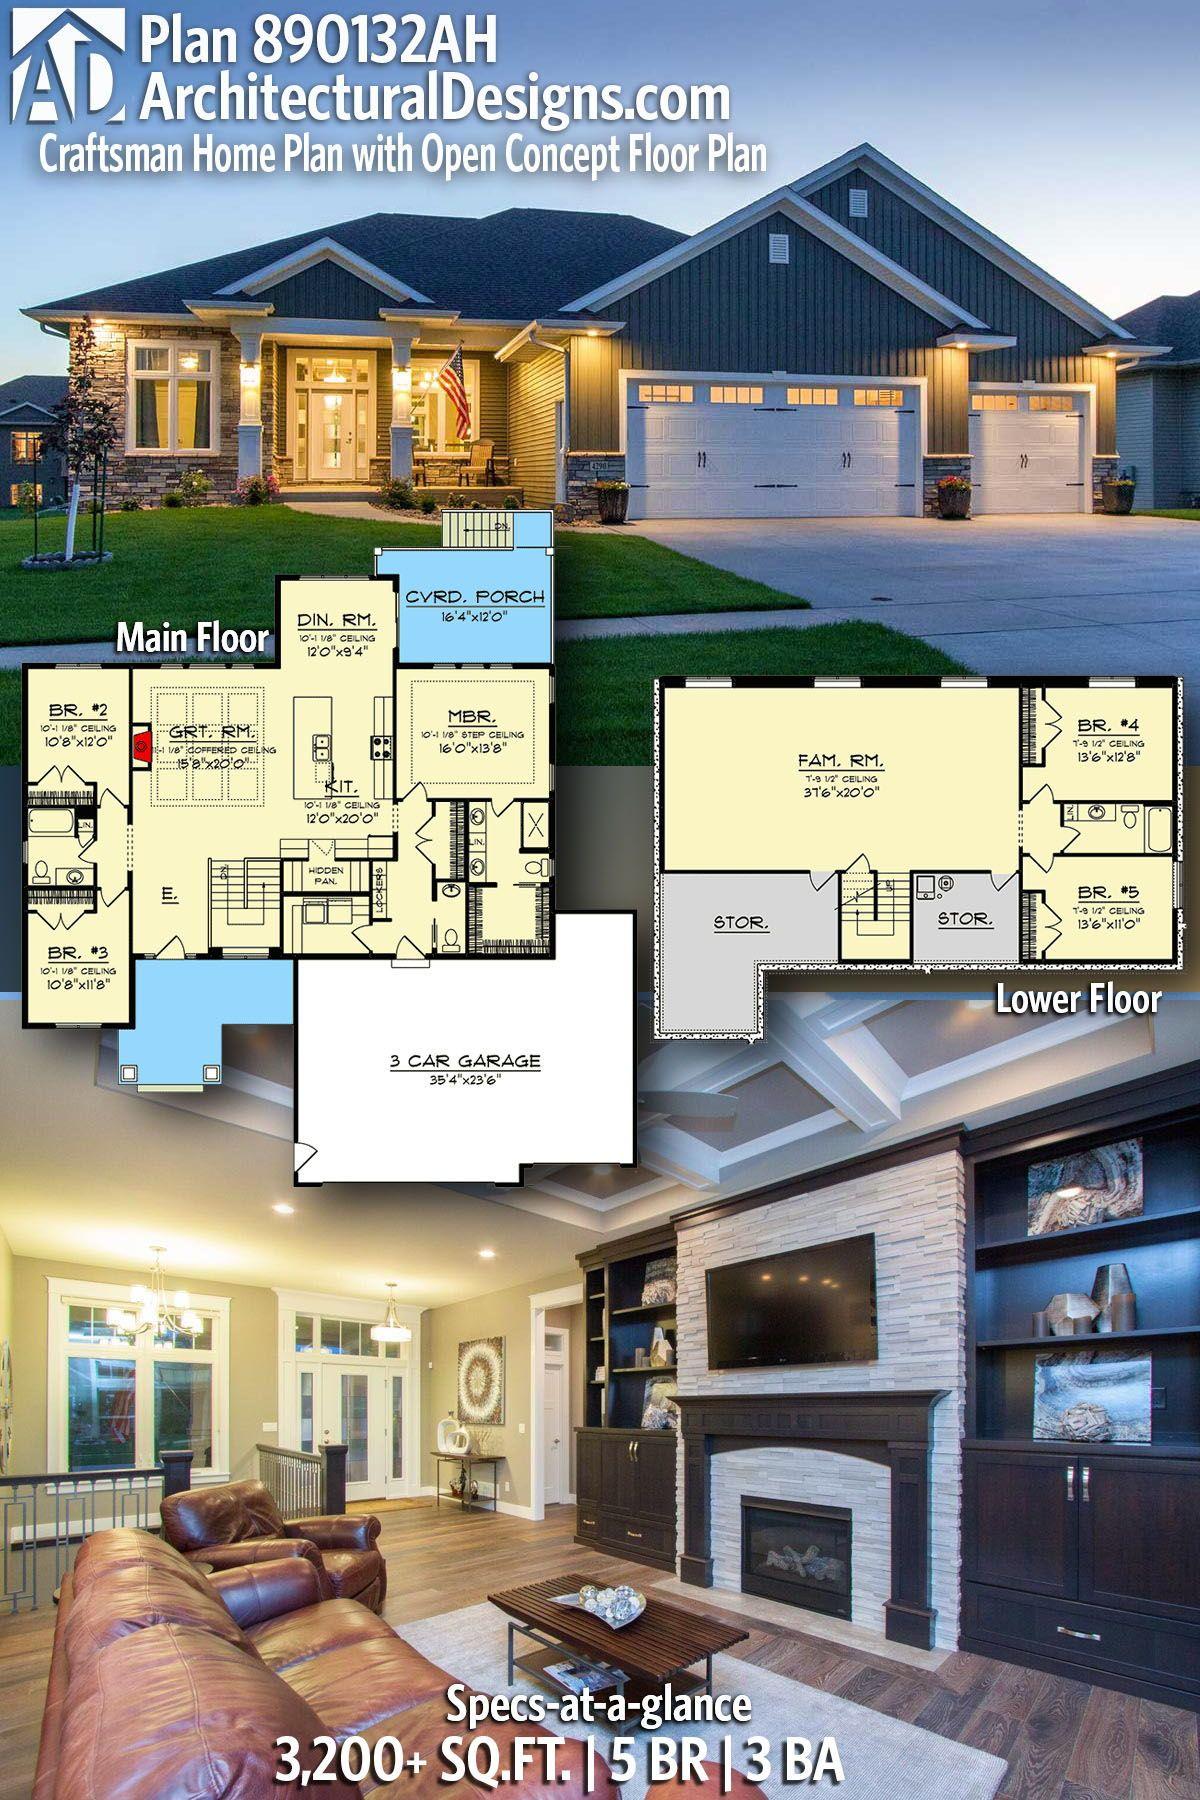 Plan 890132ah Craftsman Home Plan With Open Concept Floor Plan In 2020 Craftsman House Plans Architectural Design House Plans House Plans